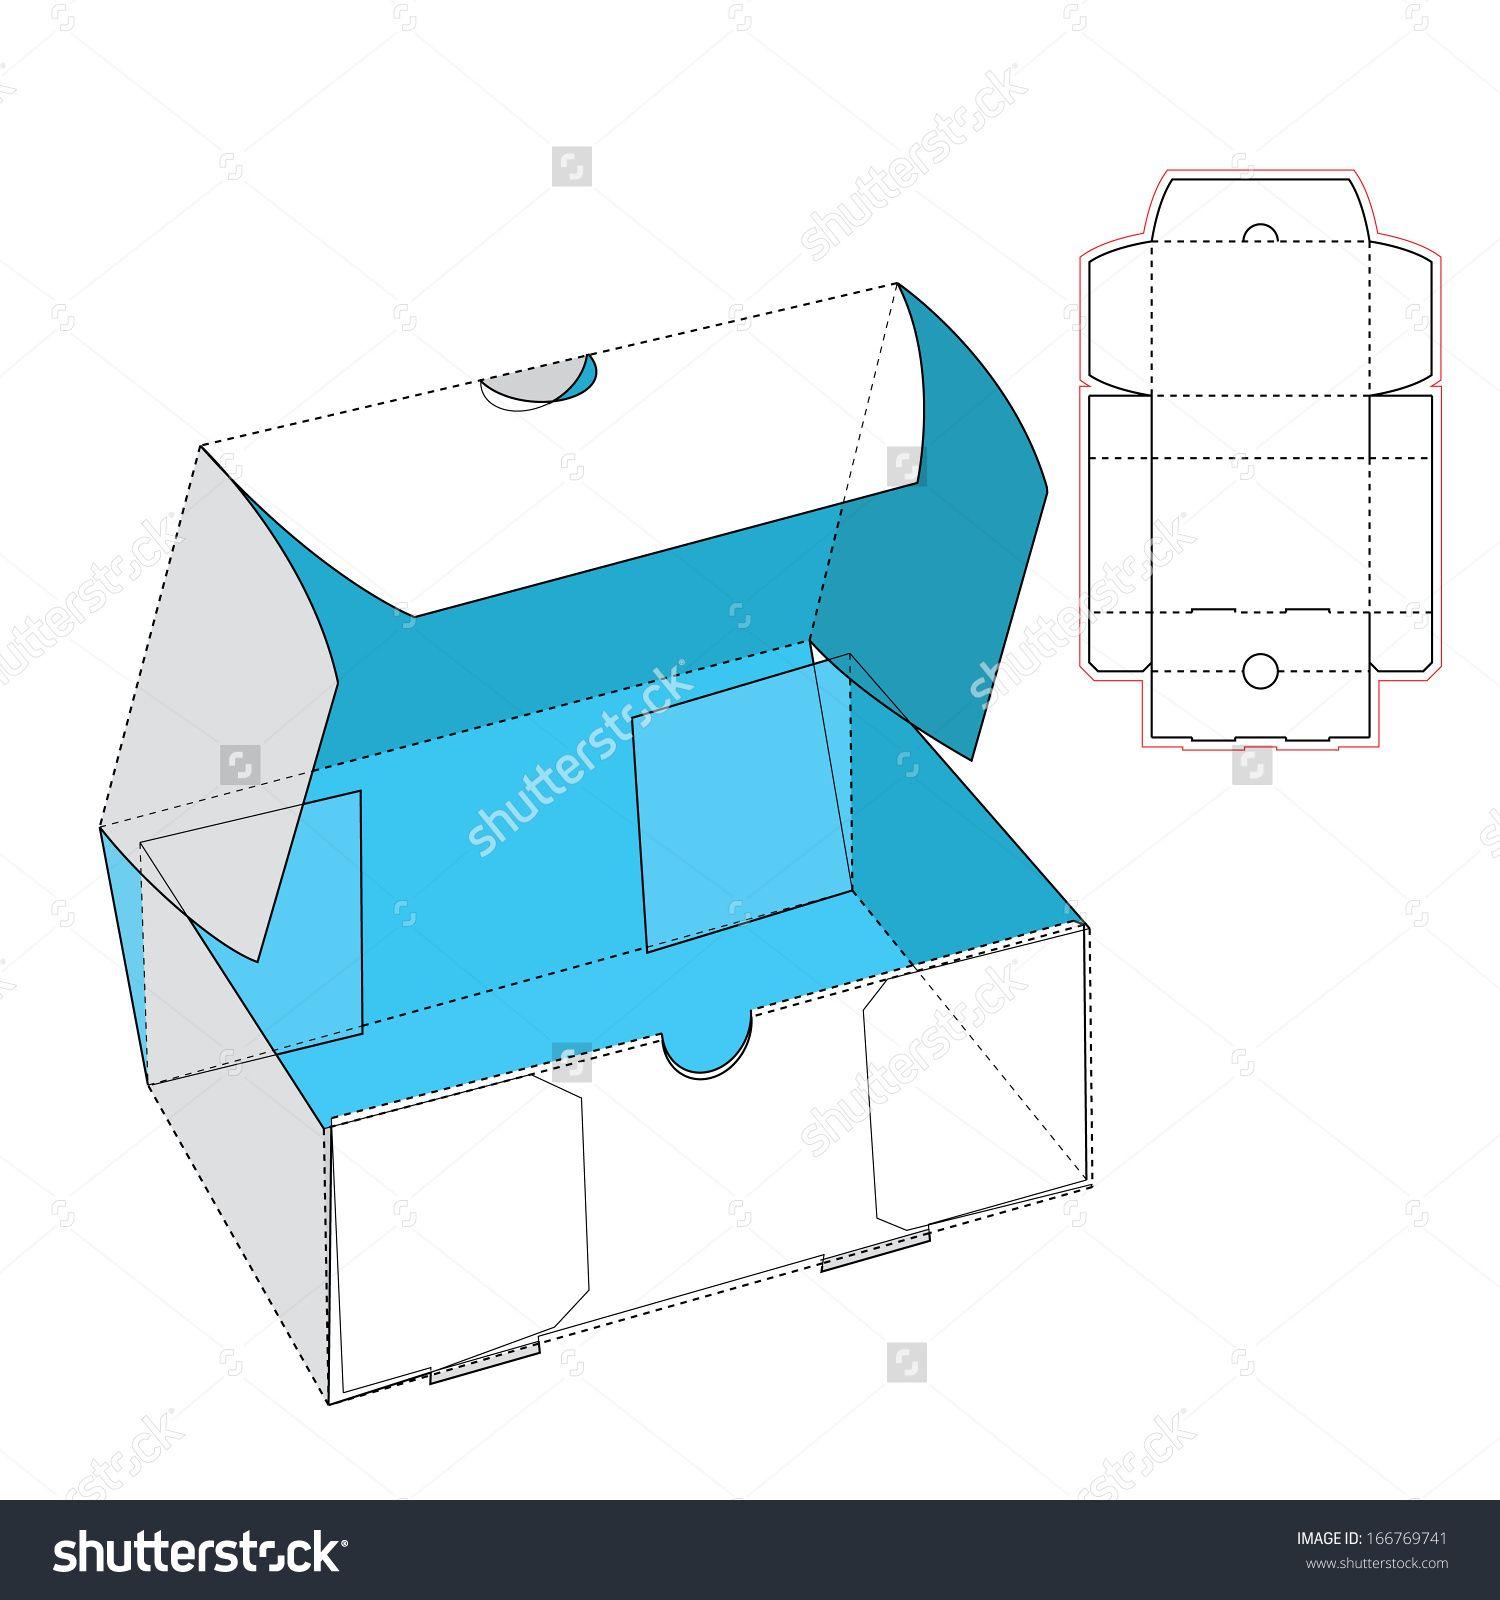 Схемы моделей коробочек